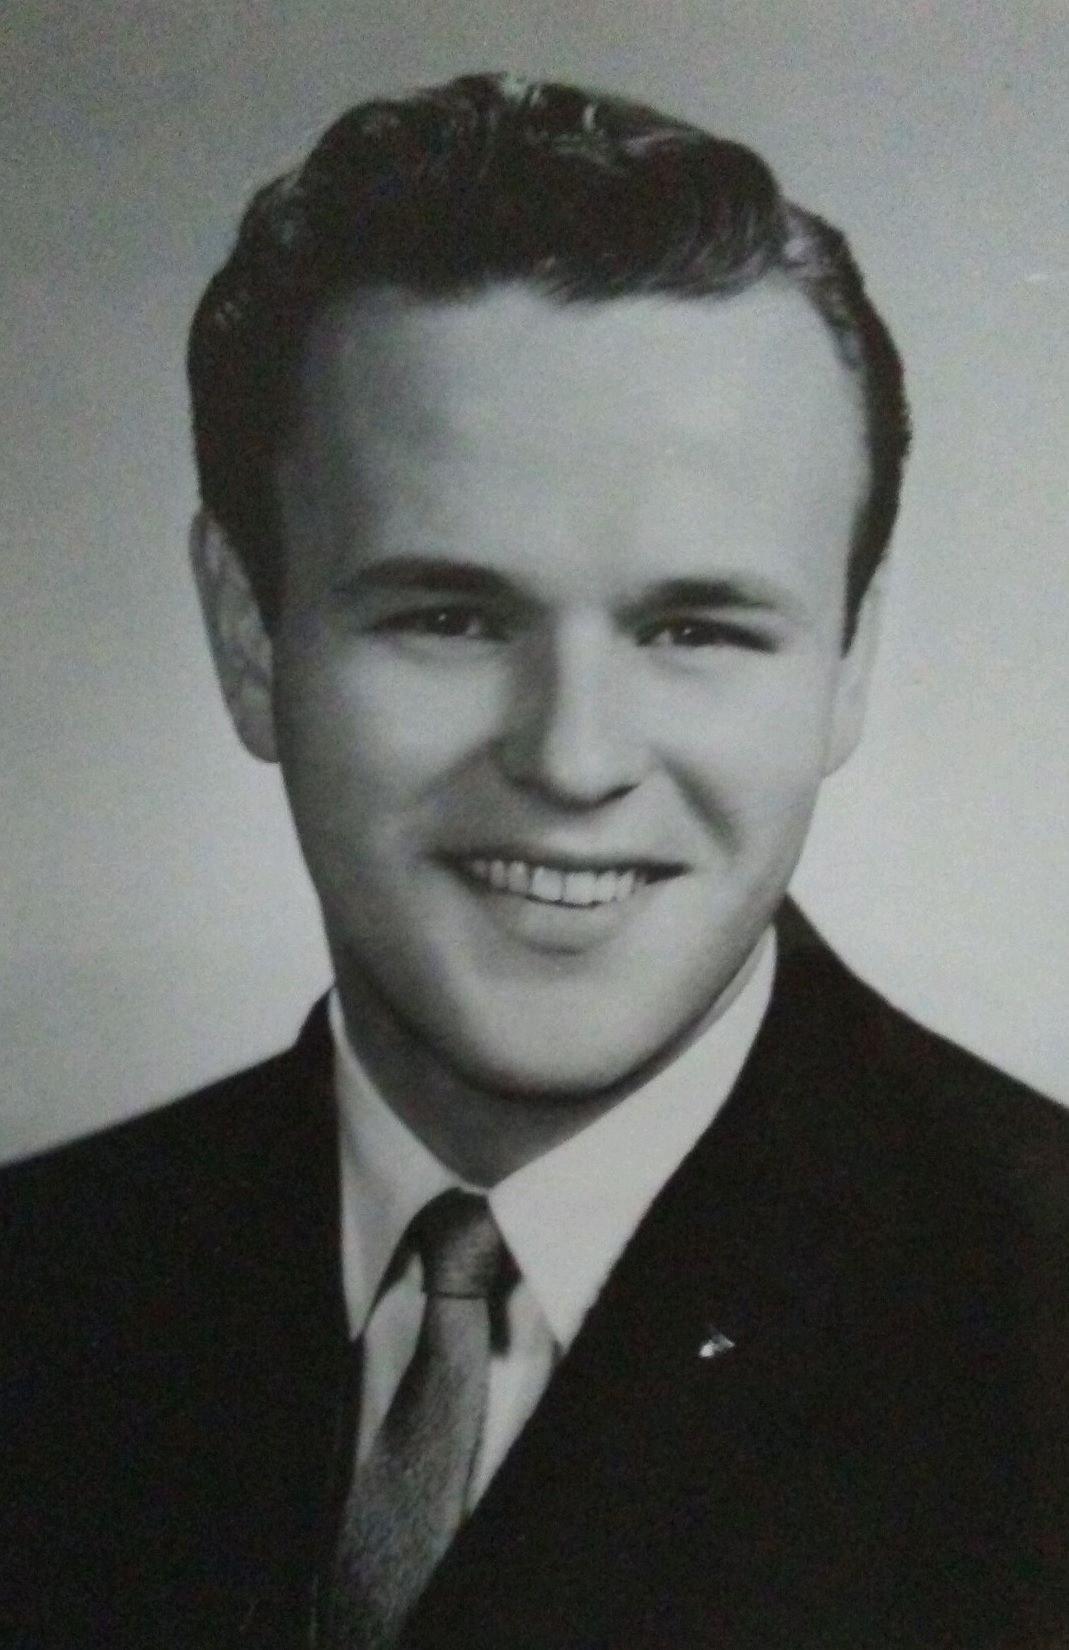 James C. Phillips